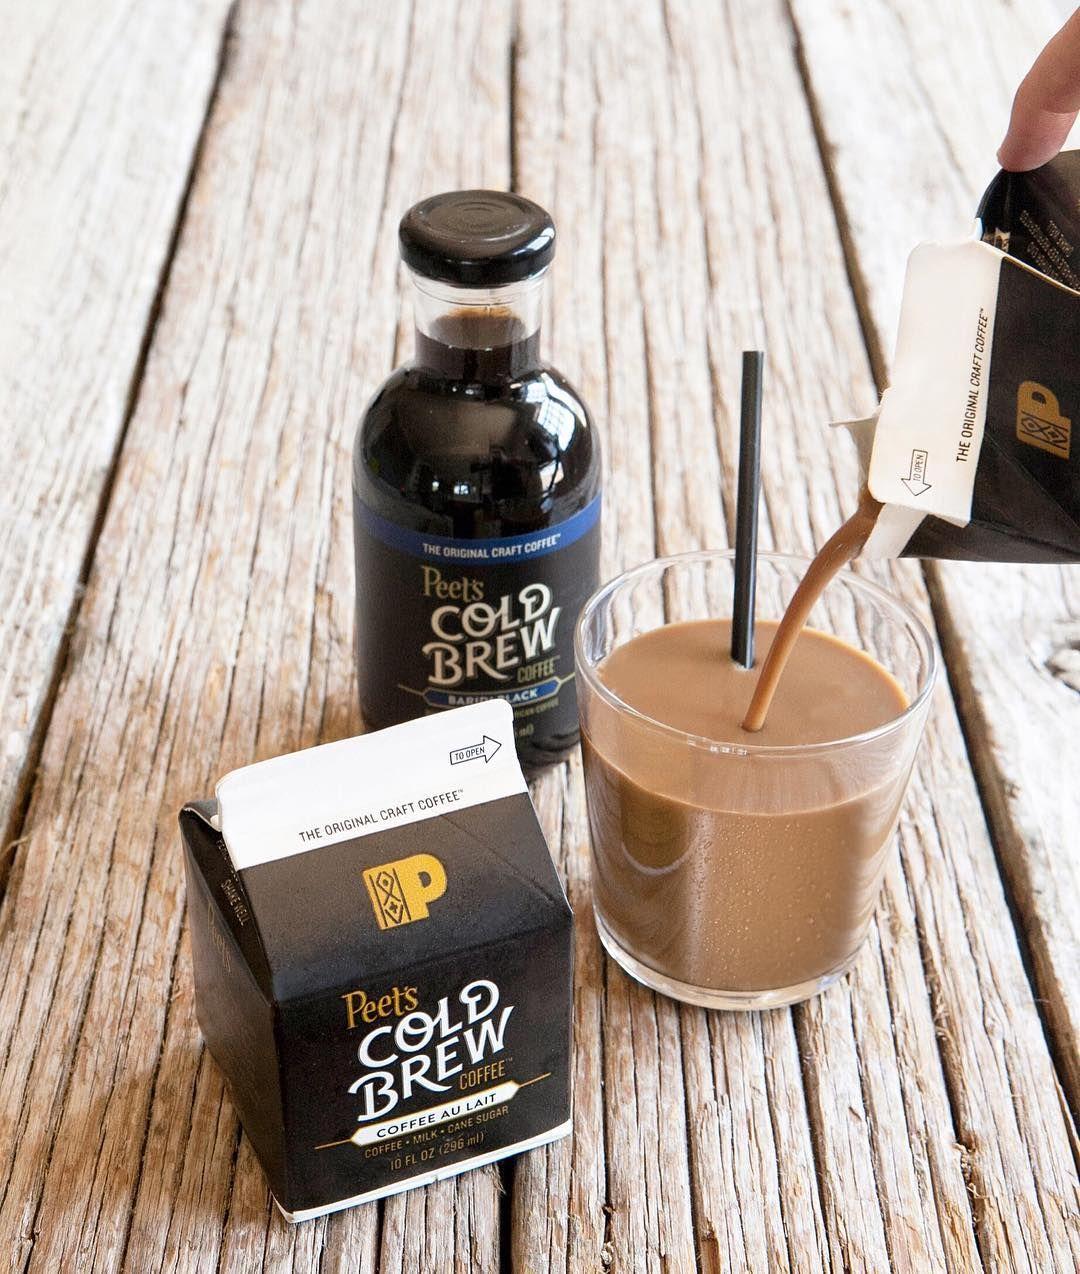 Peets coffee tea cold brew bottles and carton san